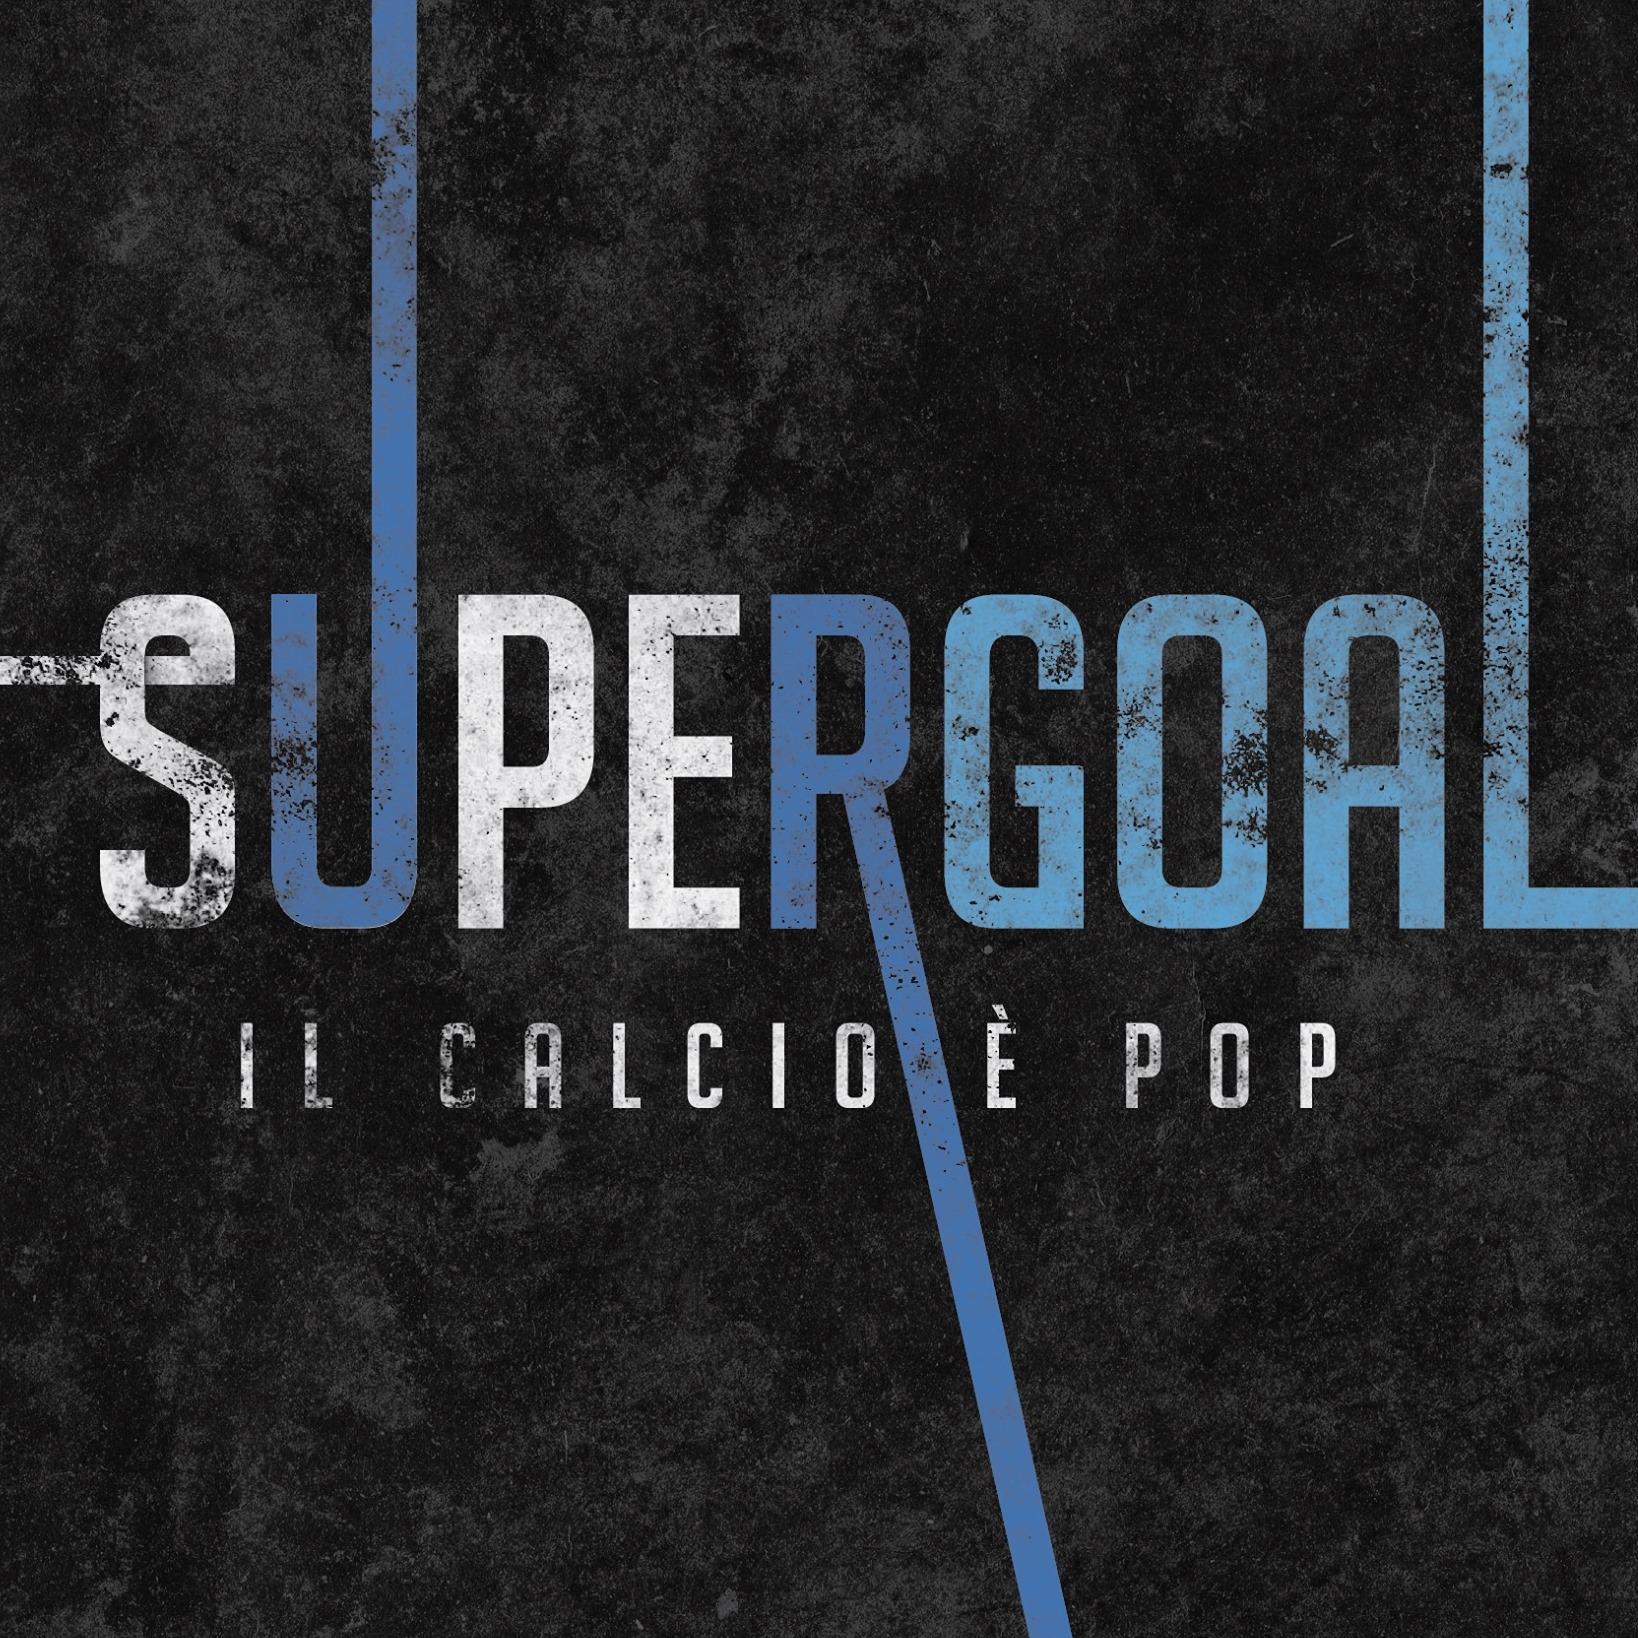 SUPERGOAL - Tutti i lunedì alle 21 su TV Luna